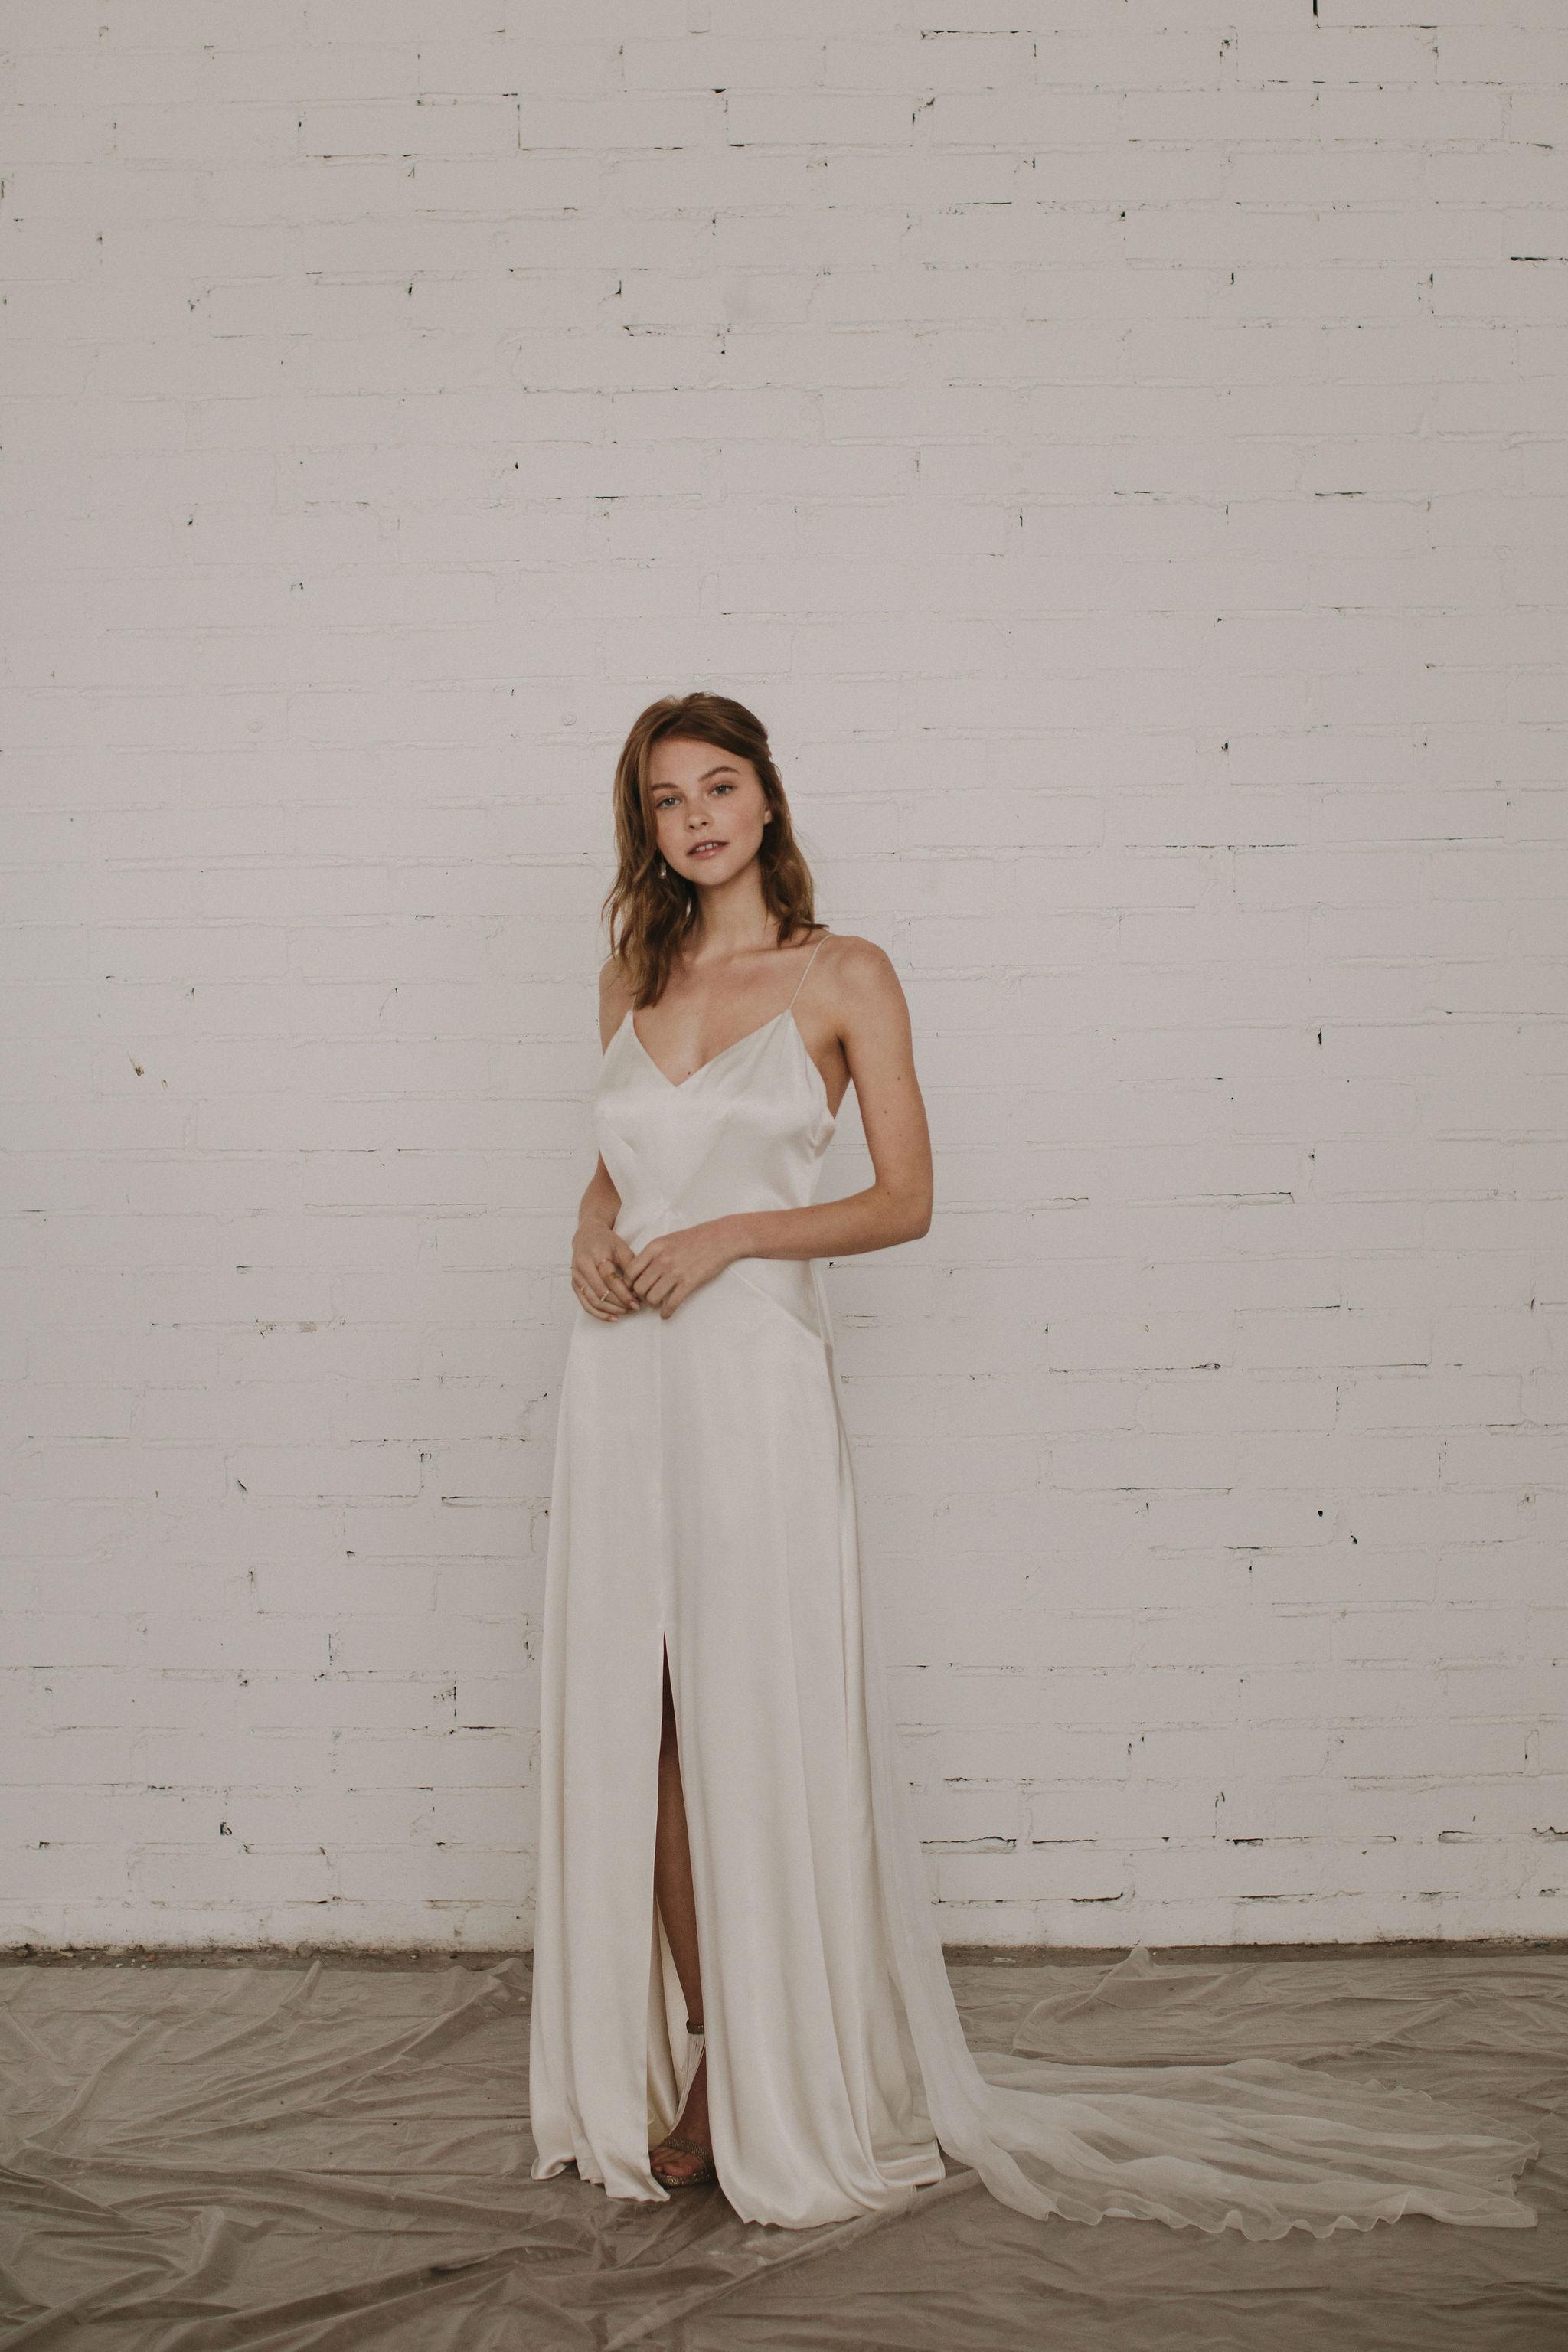 plain silk wedding dresses for 2020 at Archive 12 boutique